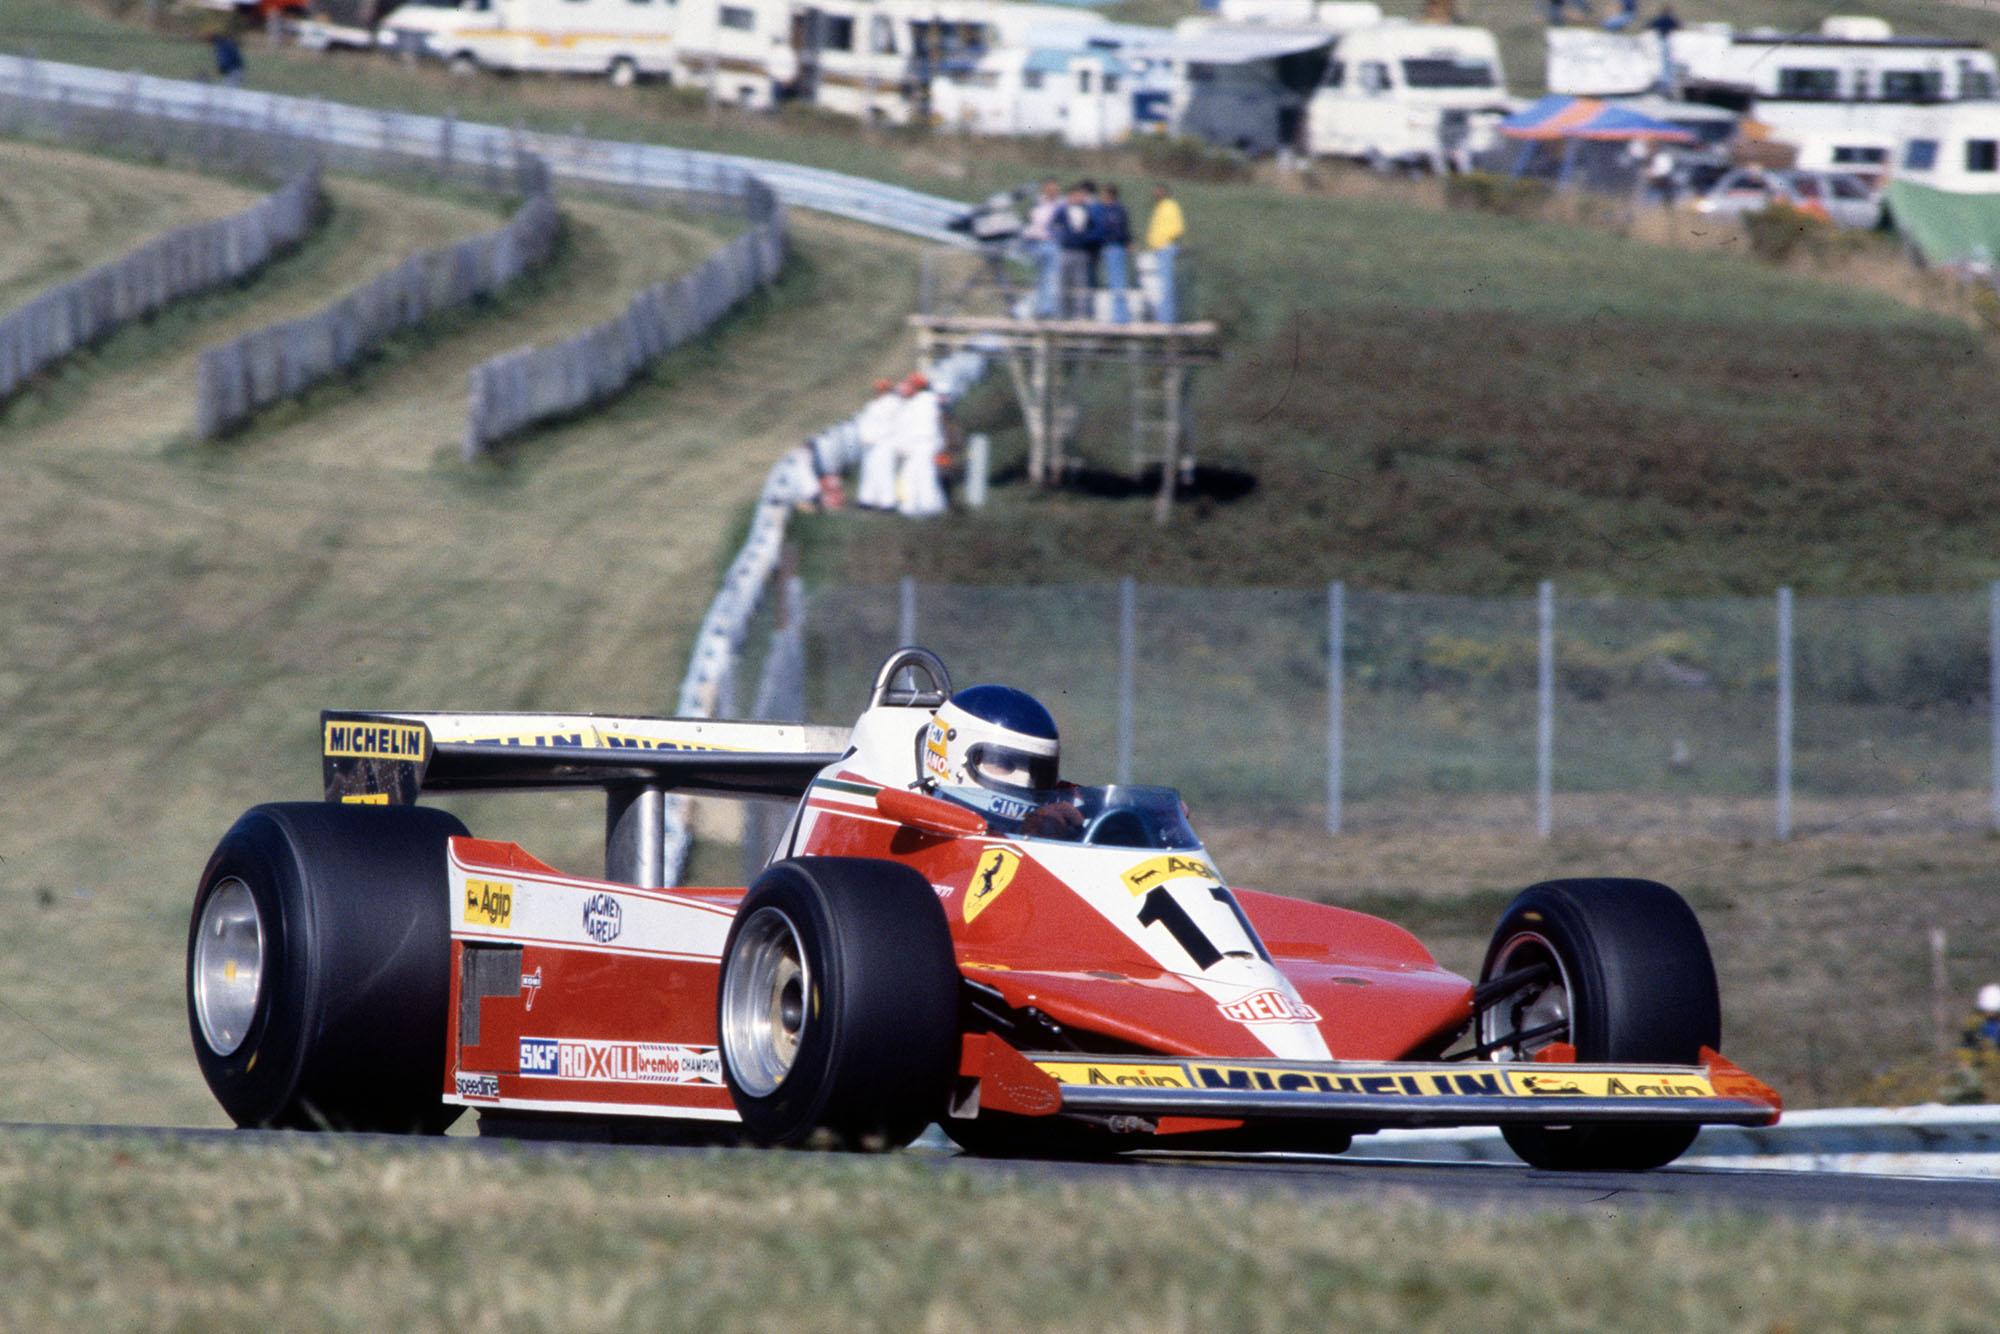 Carlos Reutemann (Ferrari) driving at the 1978 United States Grand Prix East, Watkins Glen.